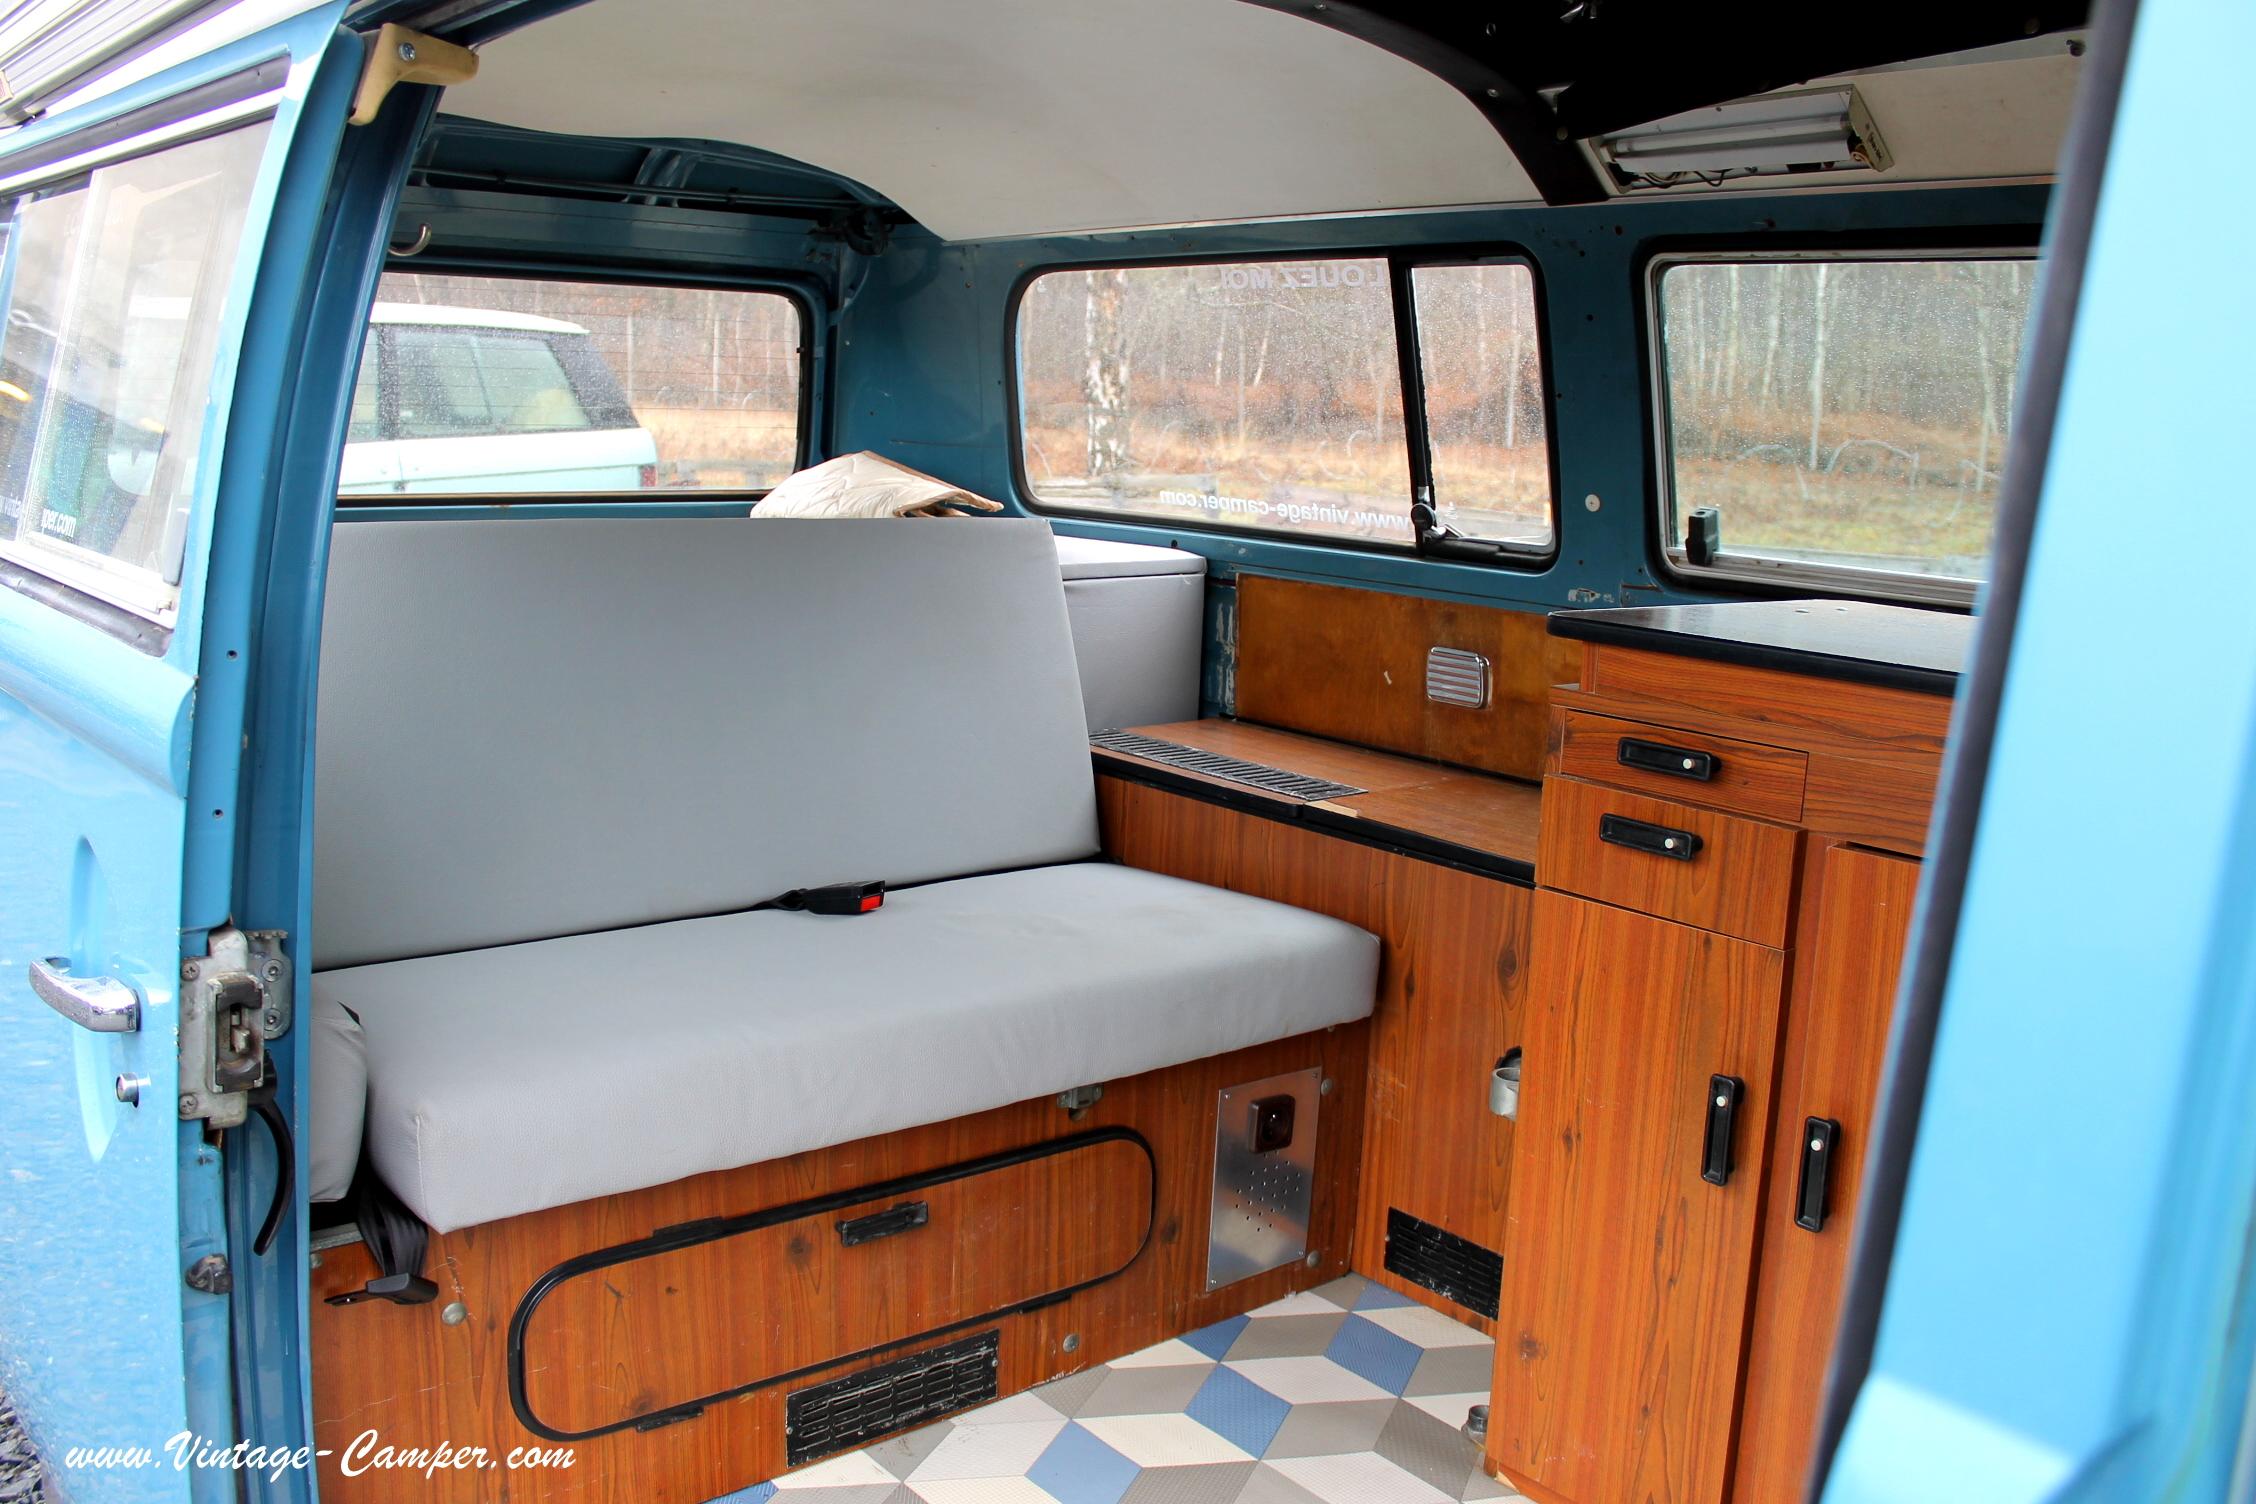 Jean paul bleu vintage camper for Interieur westfalia